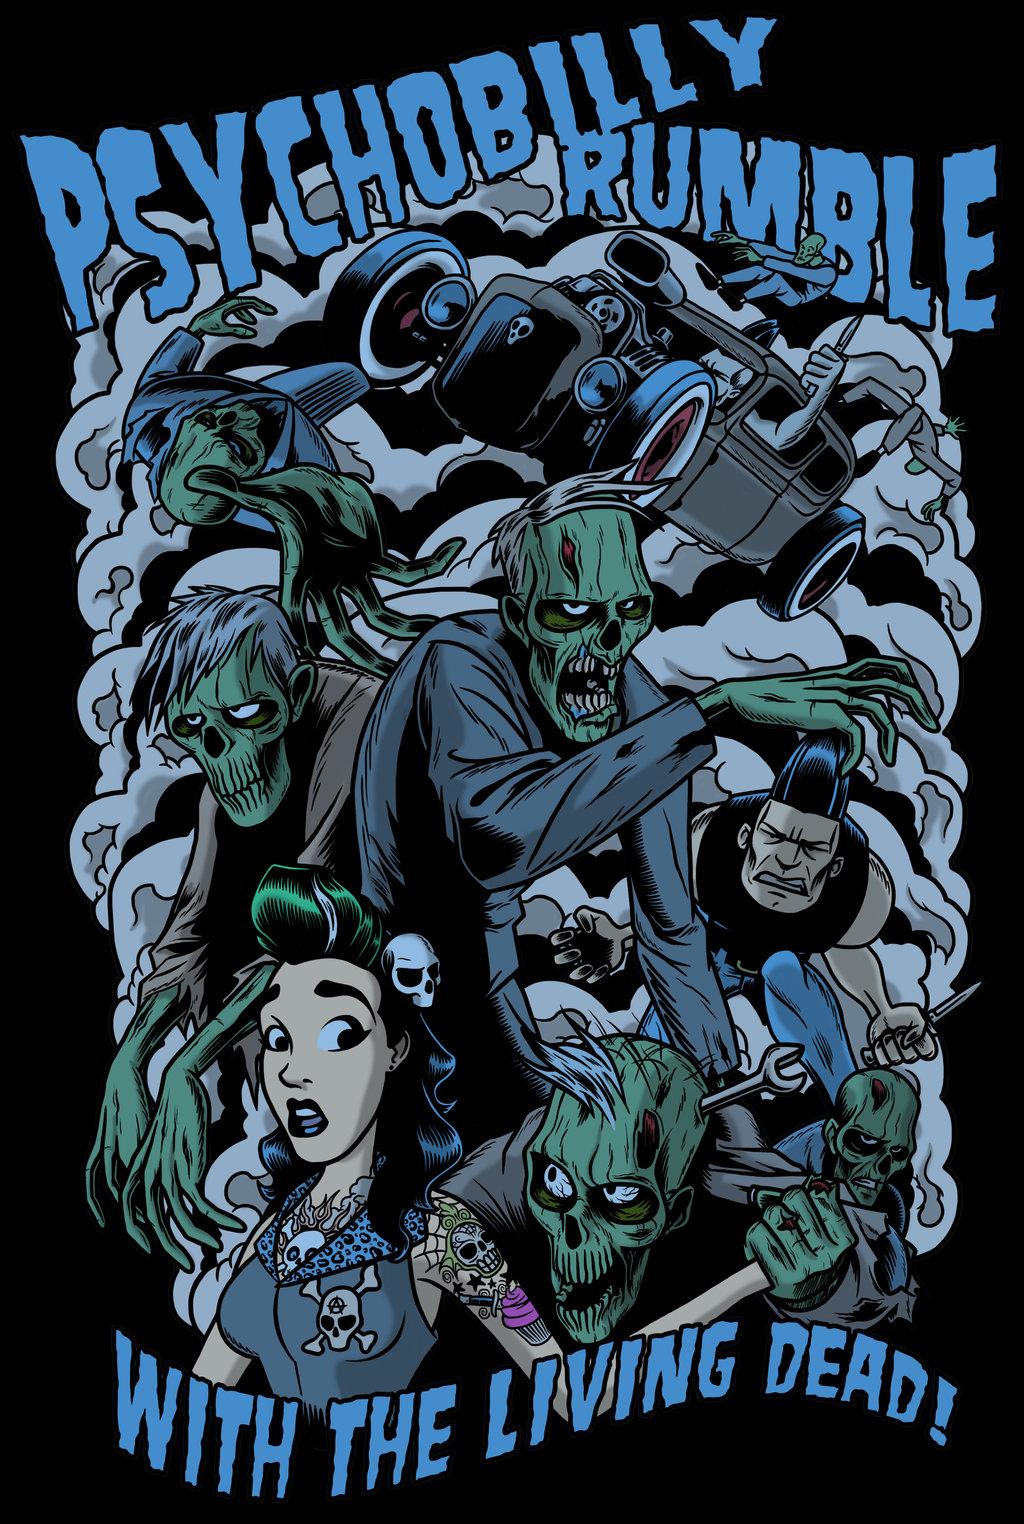 Best 54 Psychobilly Wallpaper on HipWallpaper Psychobilly 1024x1524